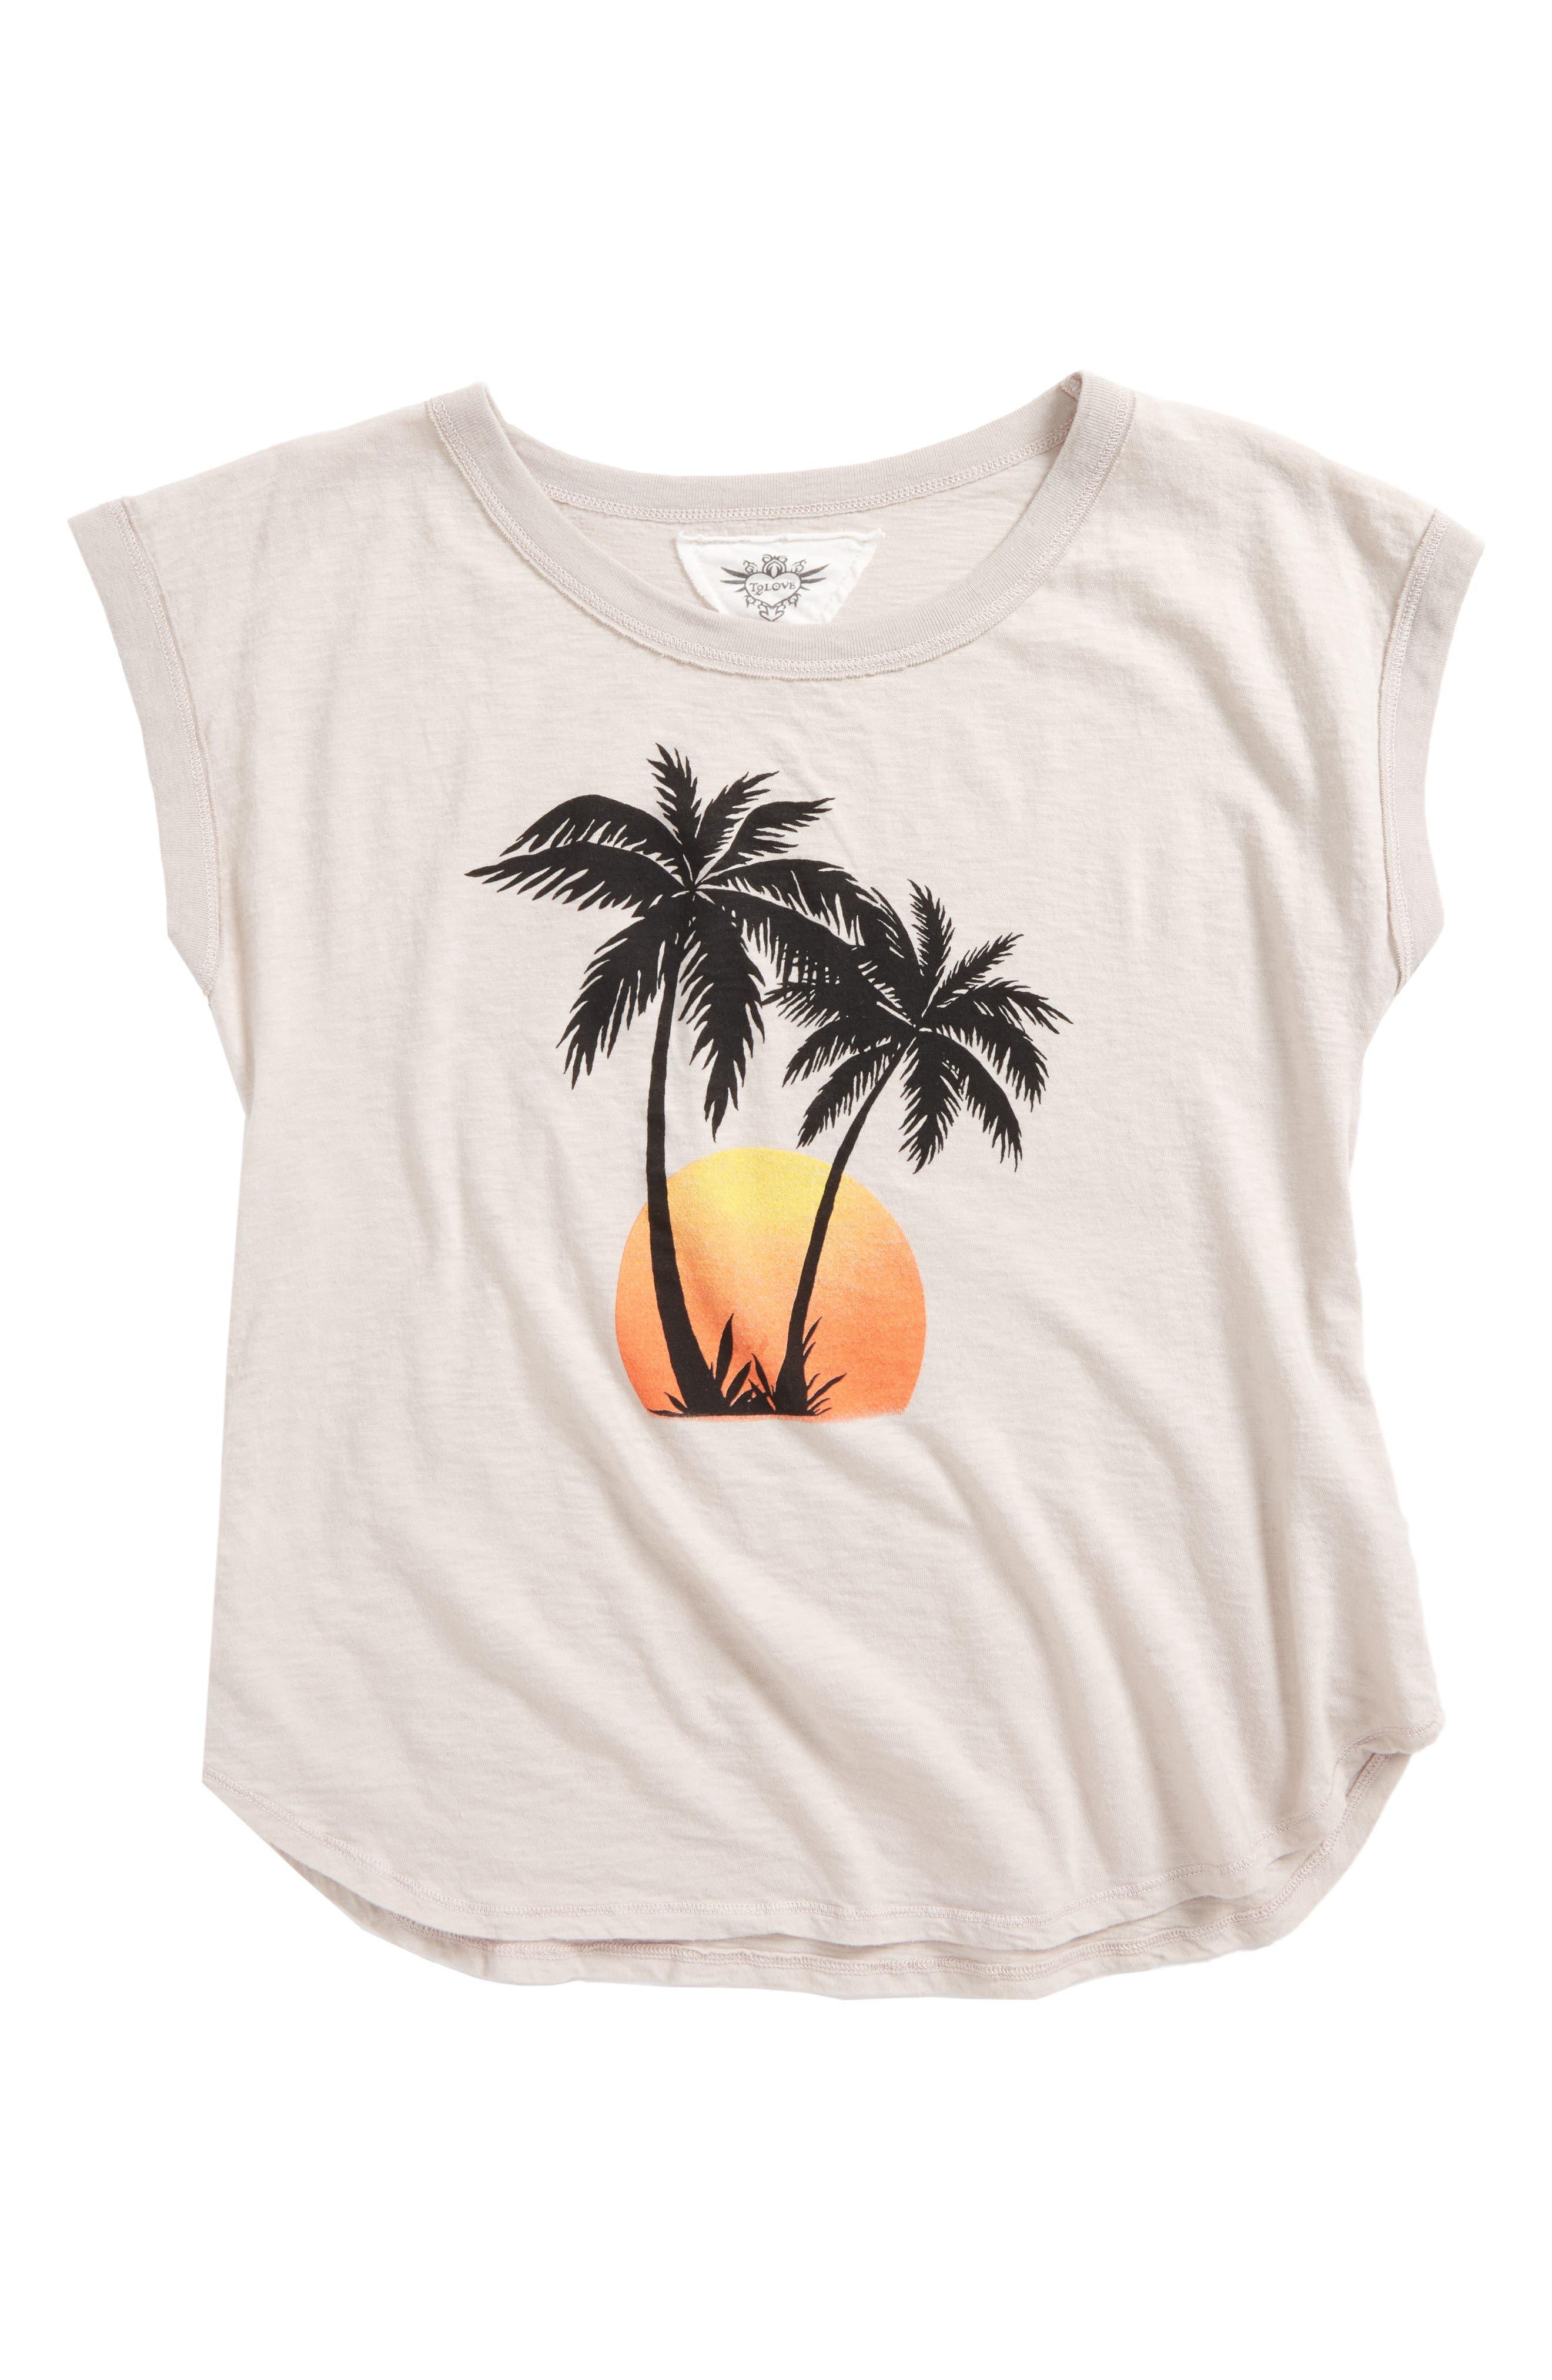 Main Image - T2 Love Palm Tree Graphic Tee (Big Girls)